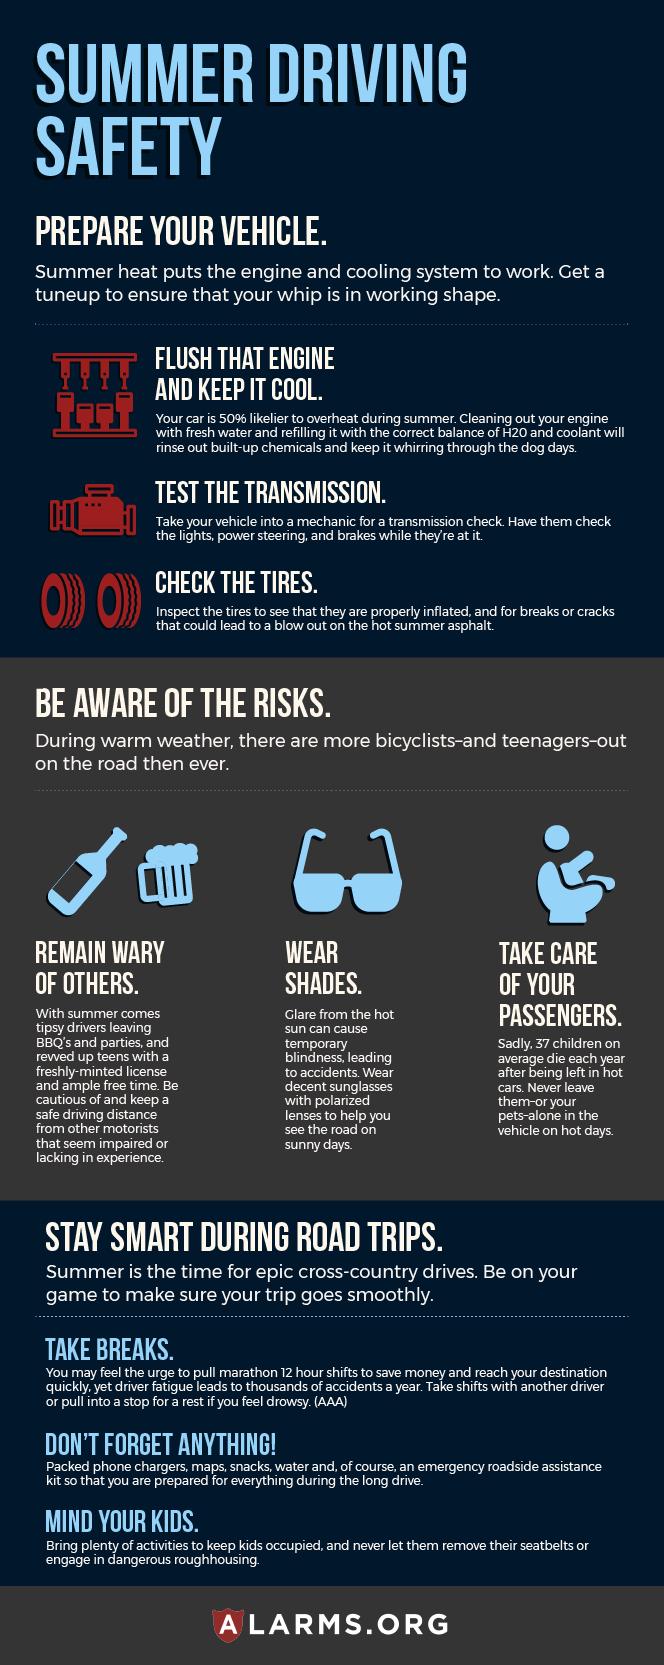 car rental summer driving tips